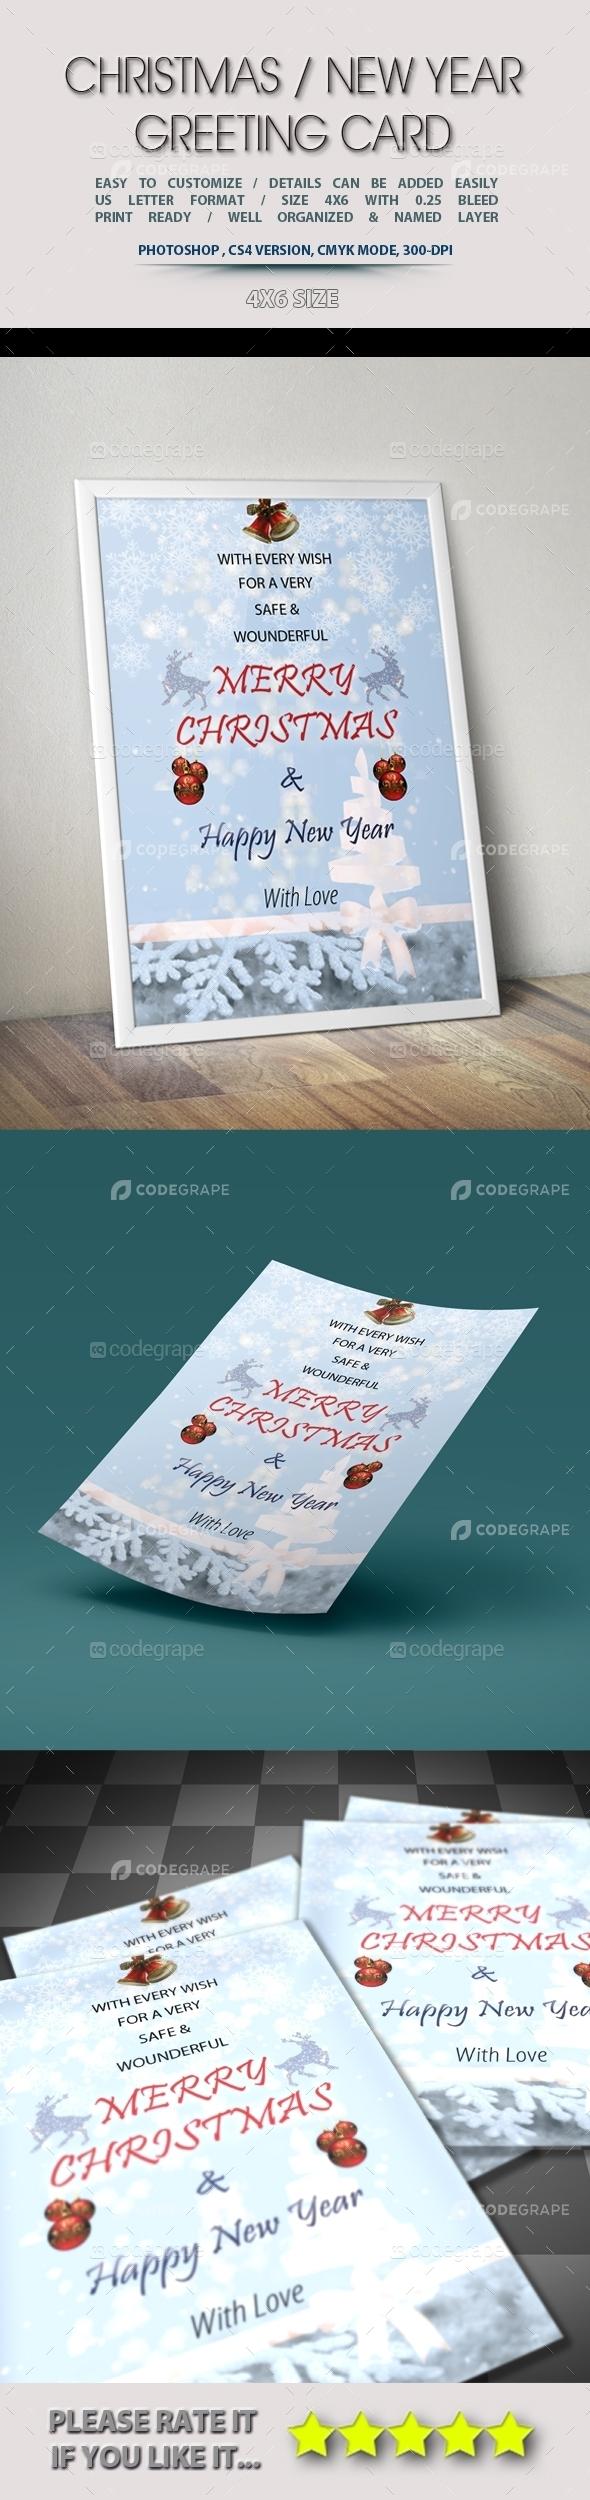 Christmas / New Year Greeting Card